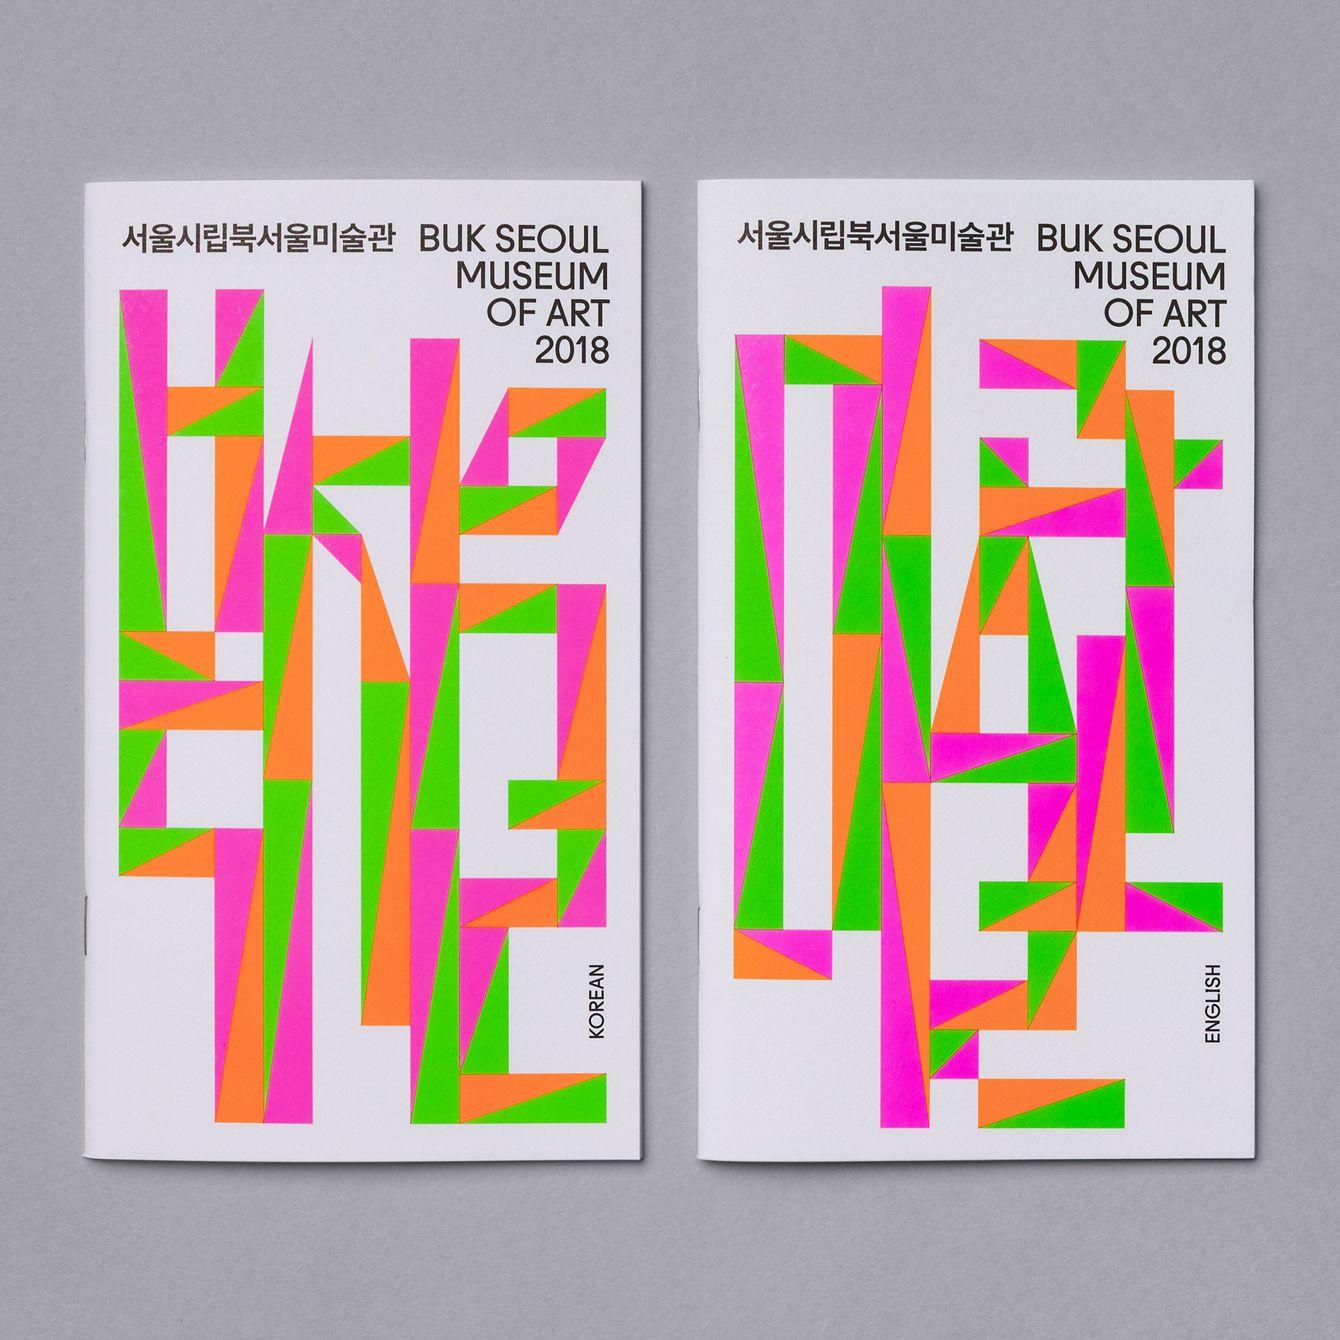 Buk Seoul Museum Of Art 2018 Season By Studio Fnt Bp O Branding Packaging And Opinion Art Exhibition Posters Exhibition Poster Museum Poster